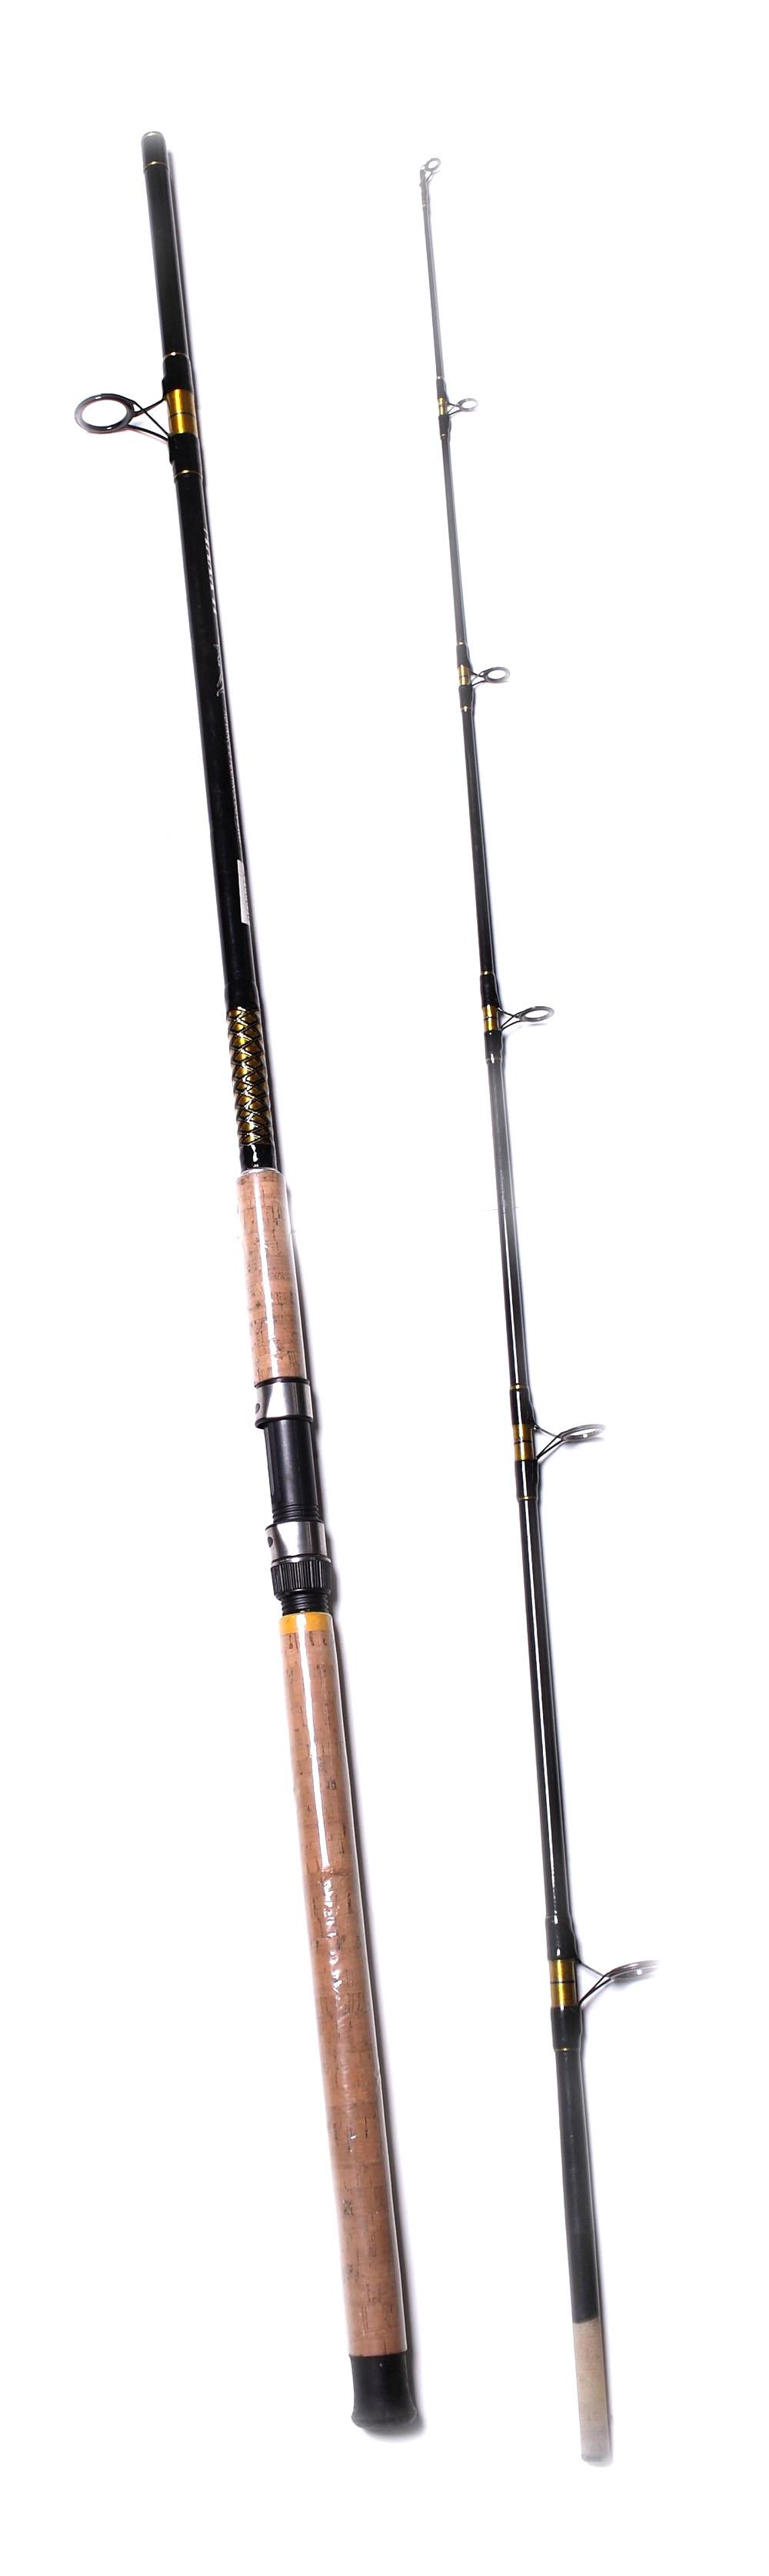 Professionale produttore top10 jigging canna da pesca for Top 10 fishing rods